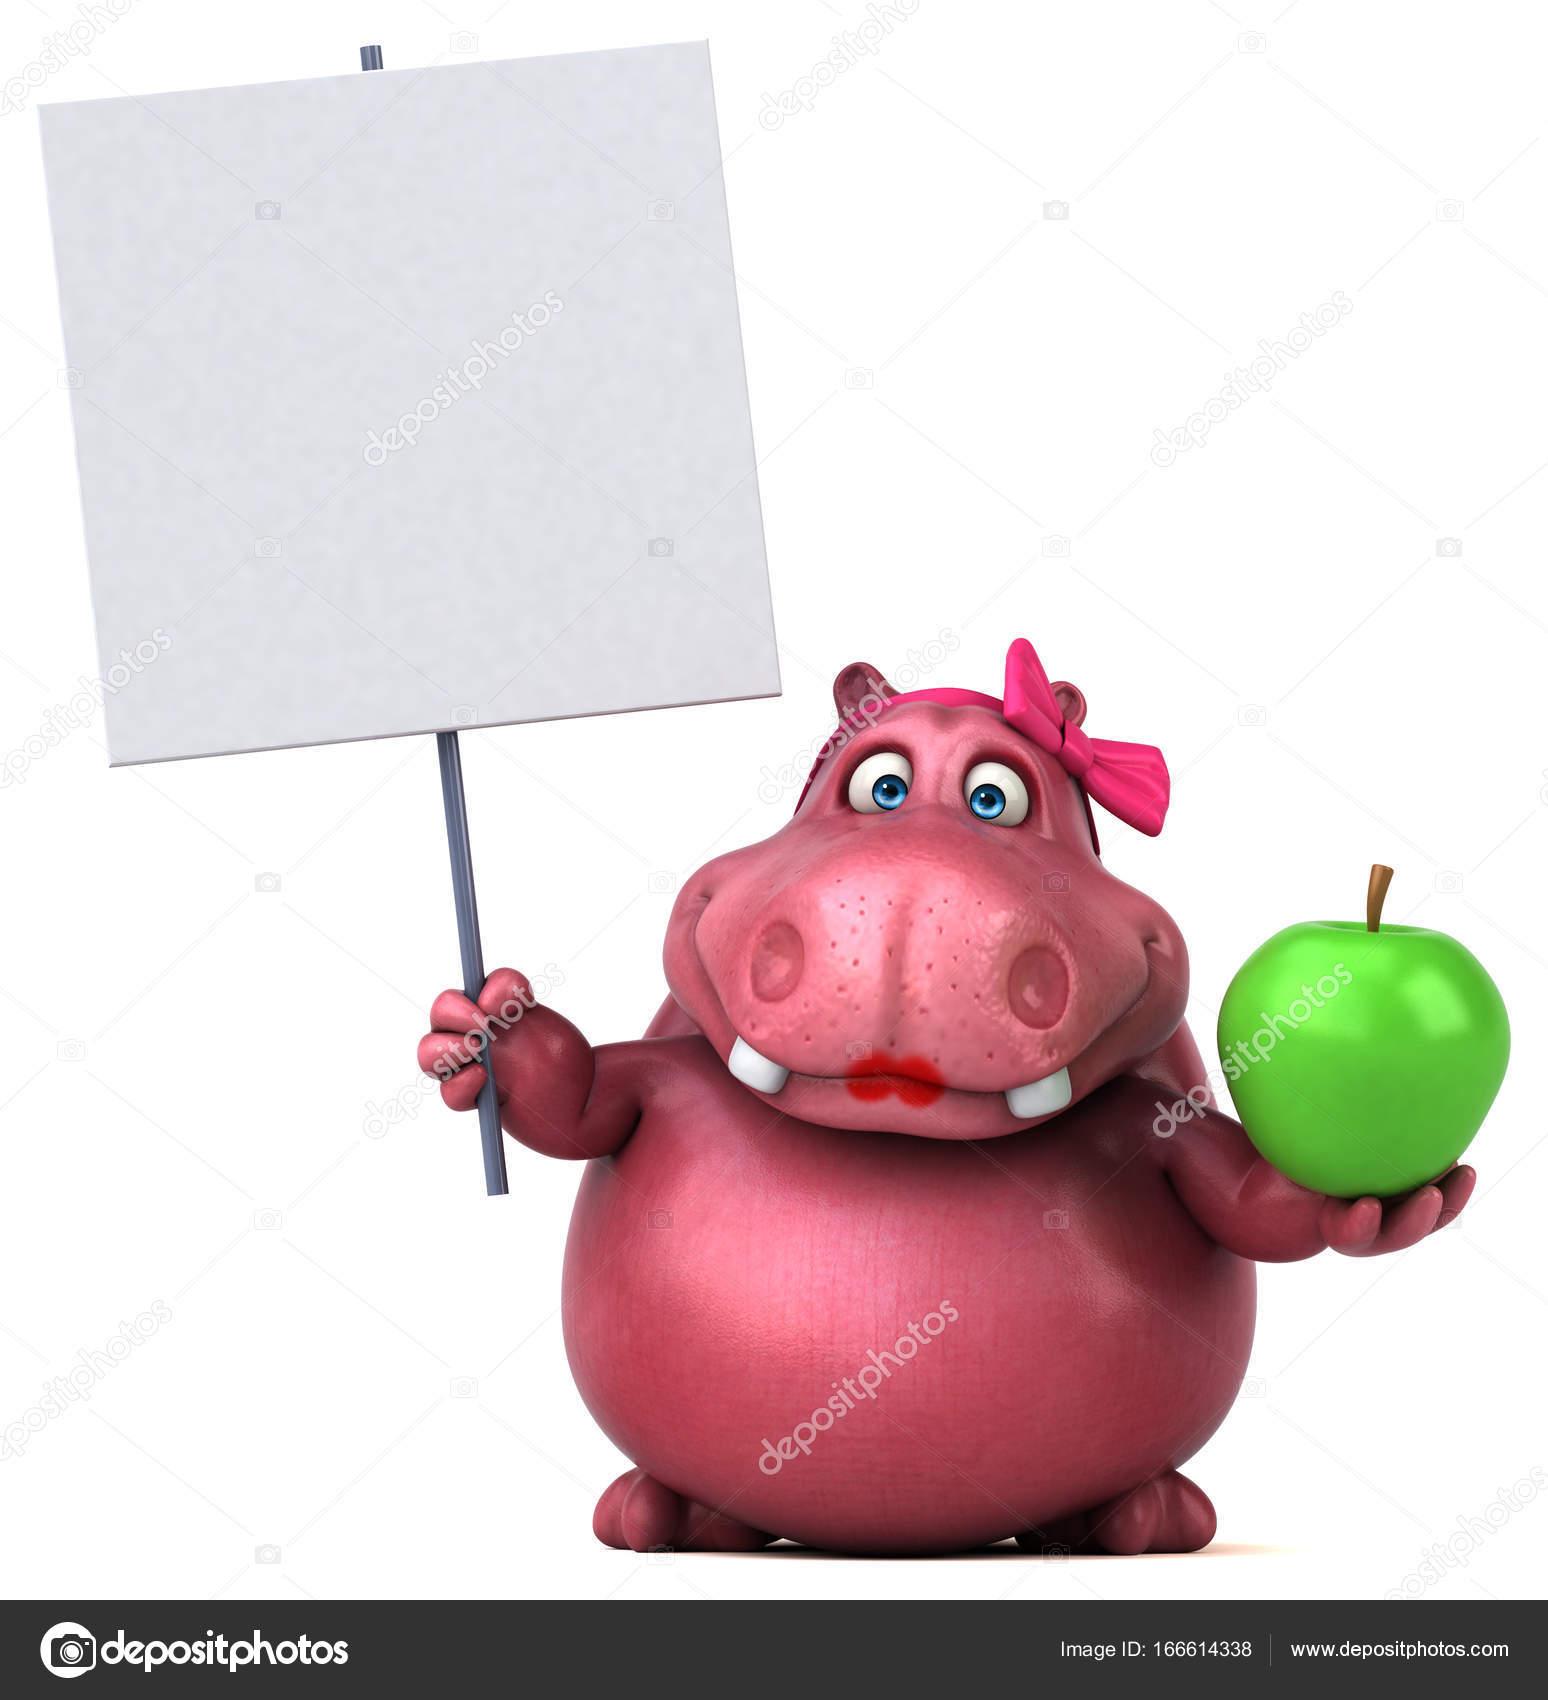 Personaggio dei cartoni animati con la mela u2014 foto stock © julos